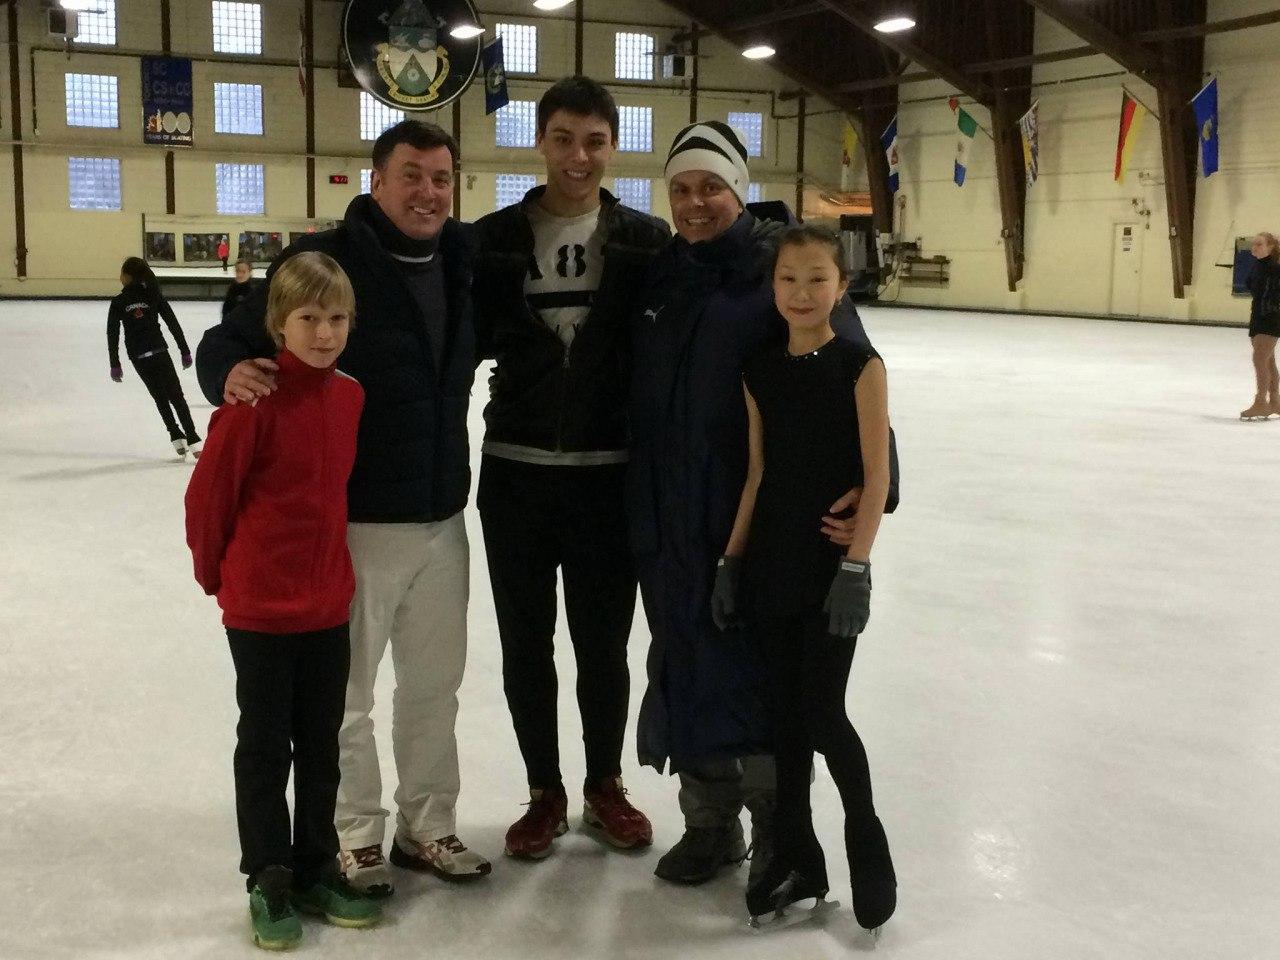 Брайан О́рсер / Brian Orser & Toronto Cricket Skating Curling Club - Страница 3 DZ05equF2Gc